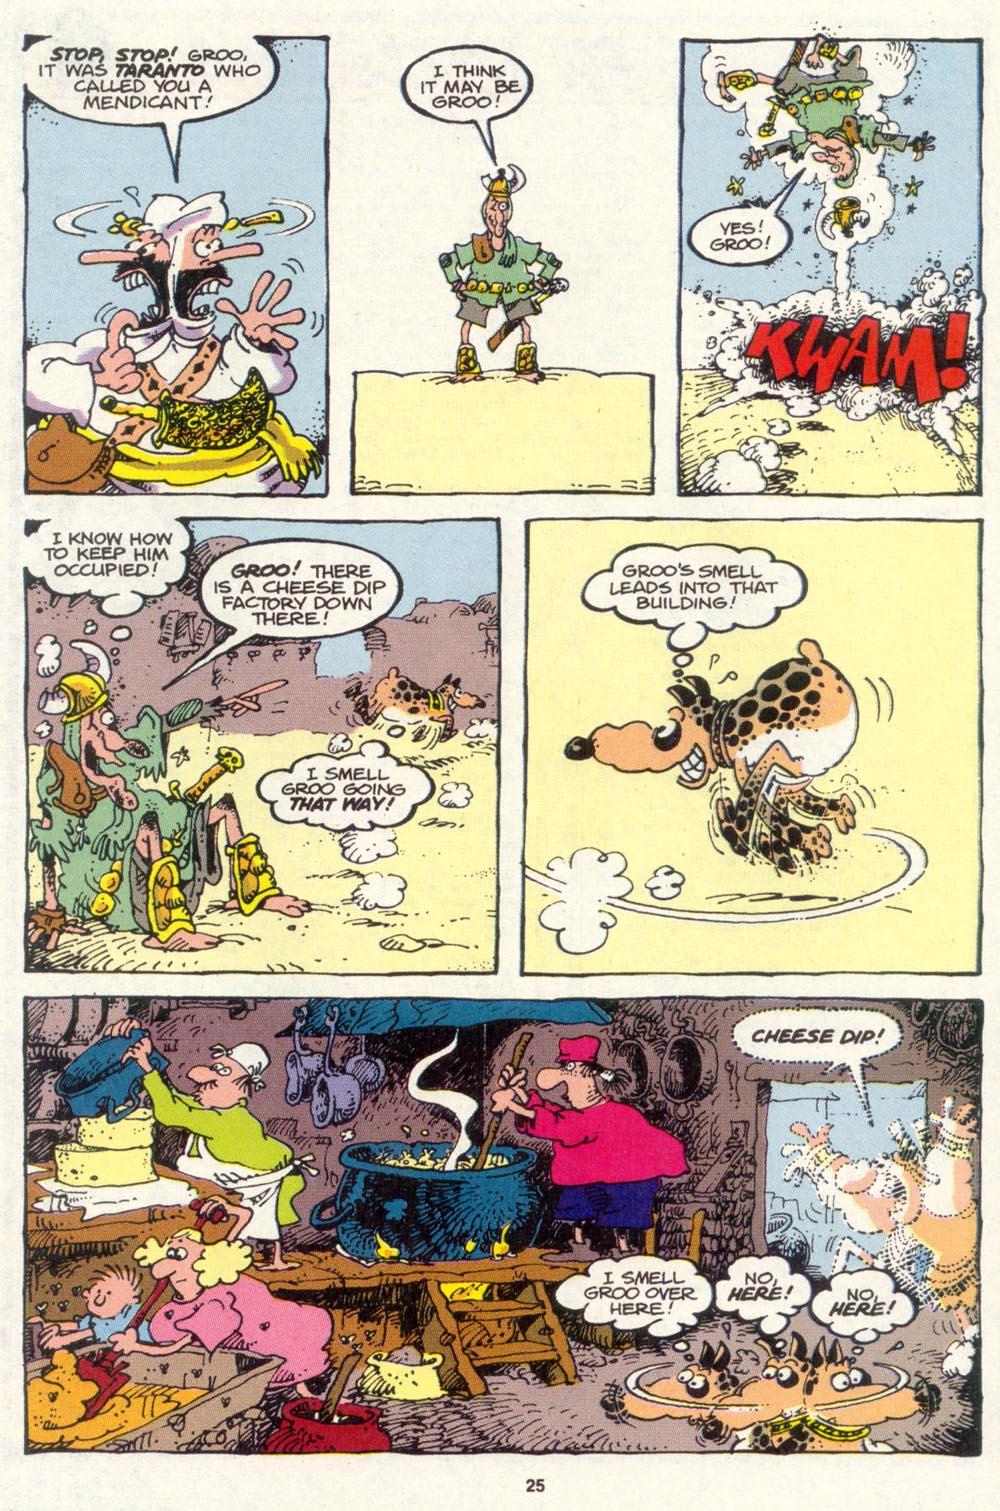 Read online Sergio Aragonés Groo the Wanderer comic -  Issue #85 - 19